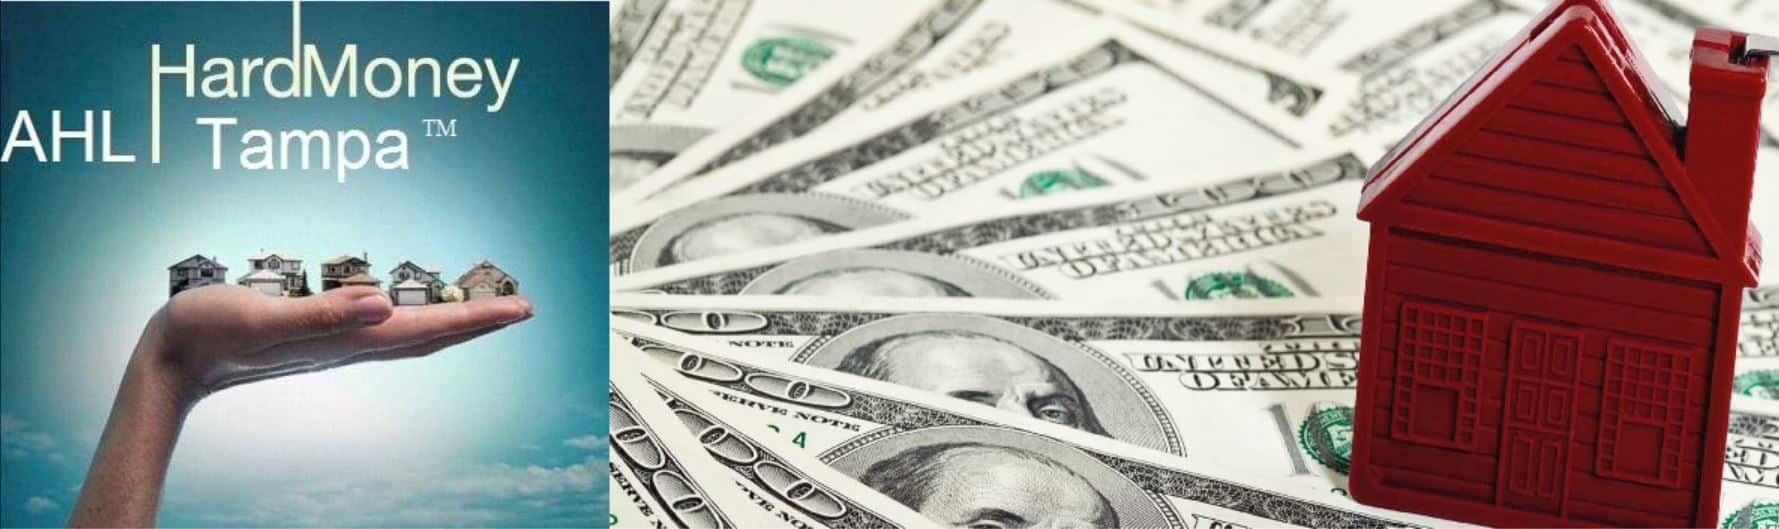 best hard money lenders florida 2020, best hard money lender florida 2020, florida hard money lenders, private money lenders florida